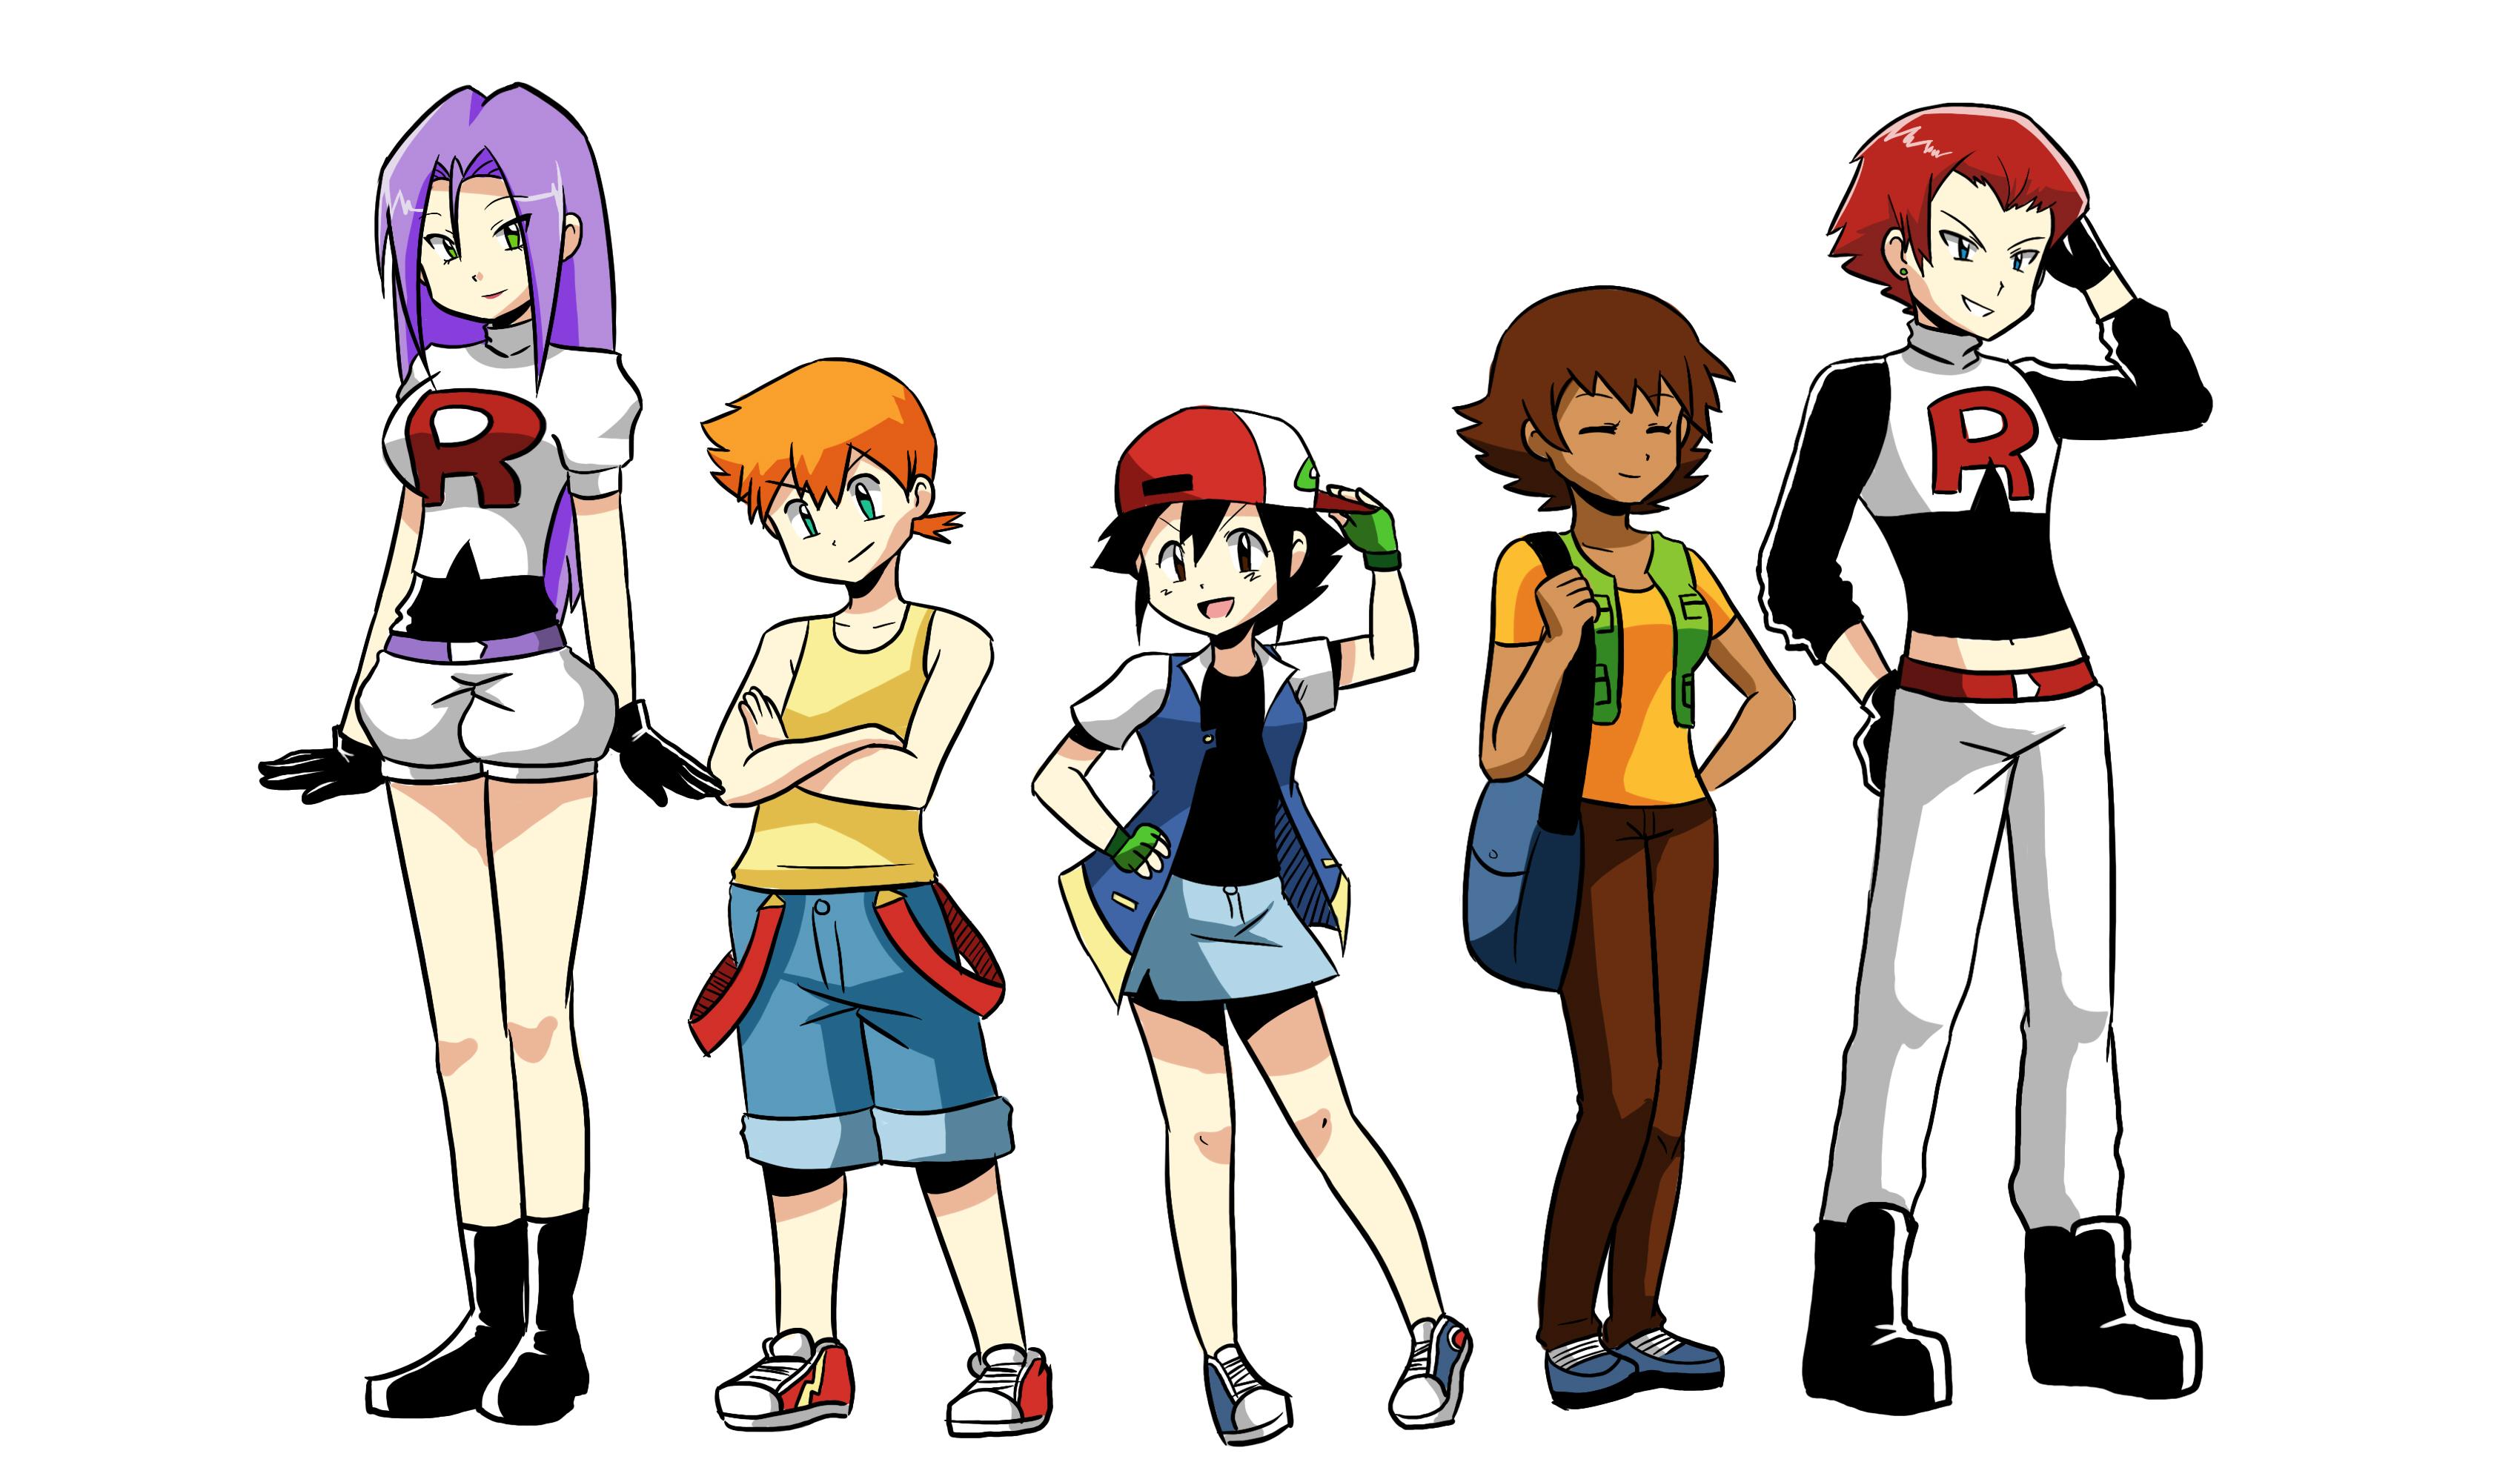 pokemon ash rule 63 images pokemon images